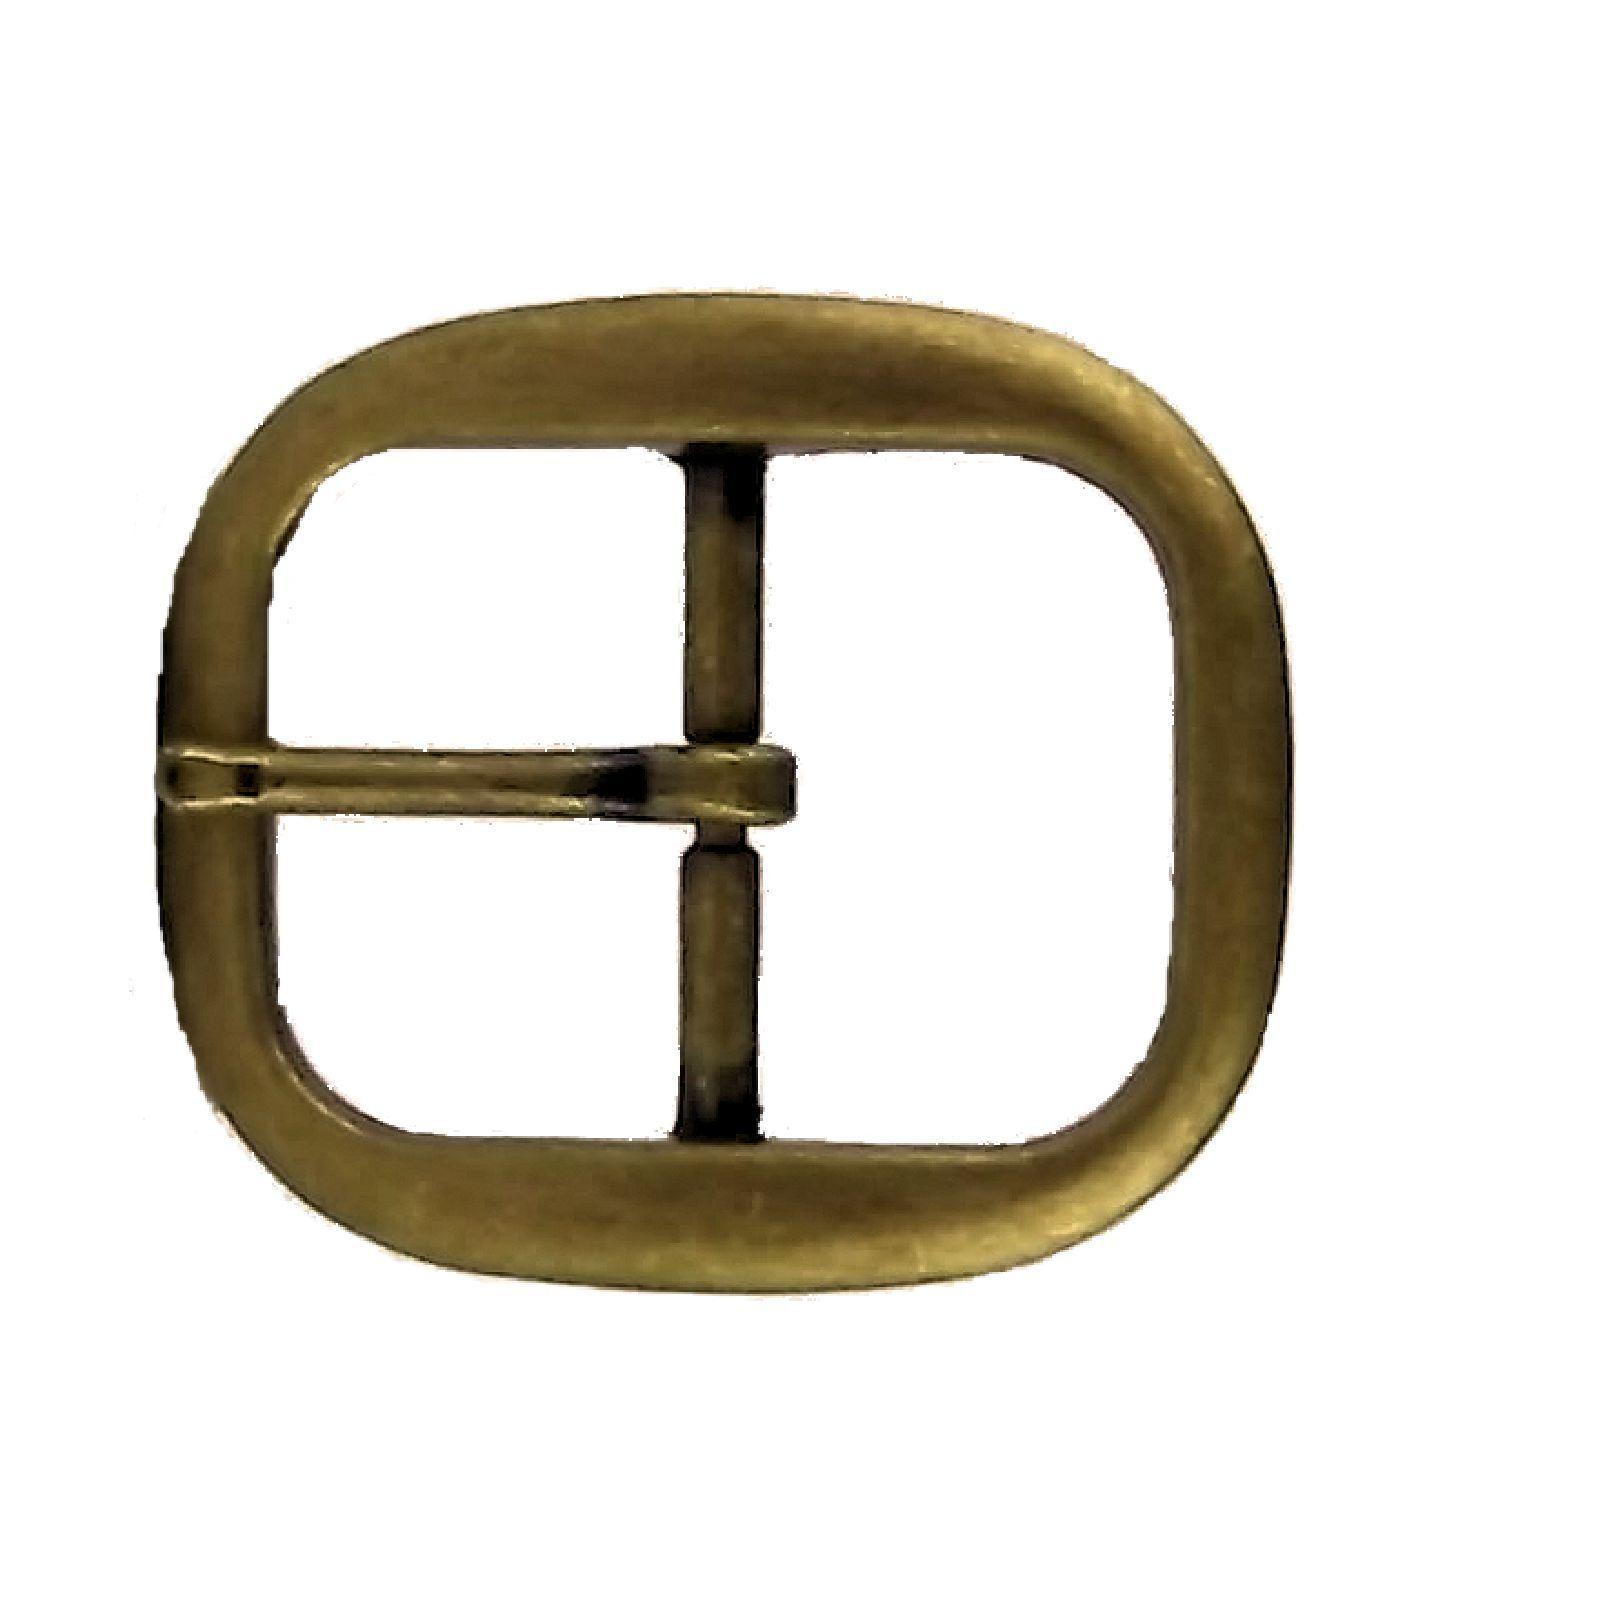 "Antique Brass Finish 1640-09 1.25/"" Wave Buckle 3.2 cm"